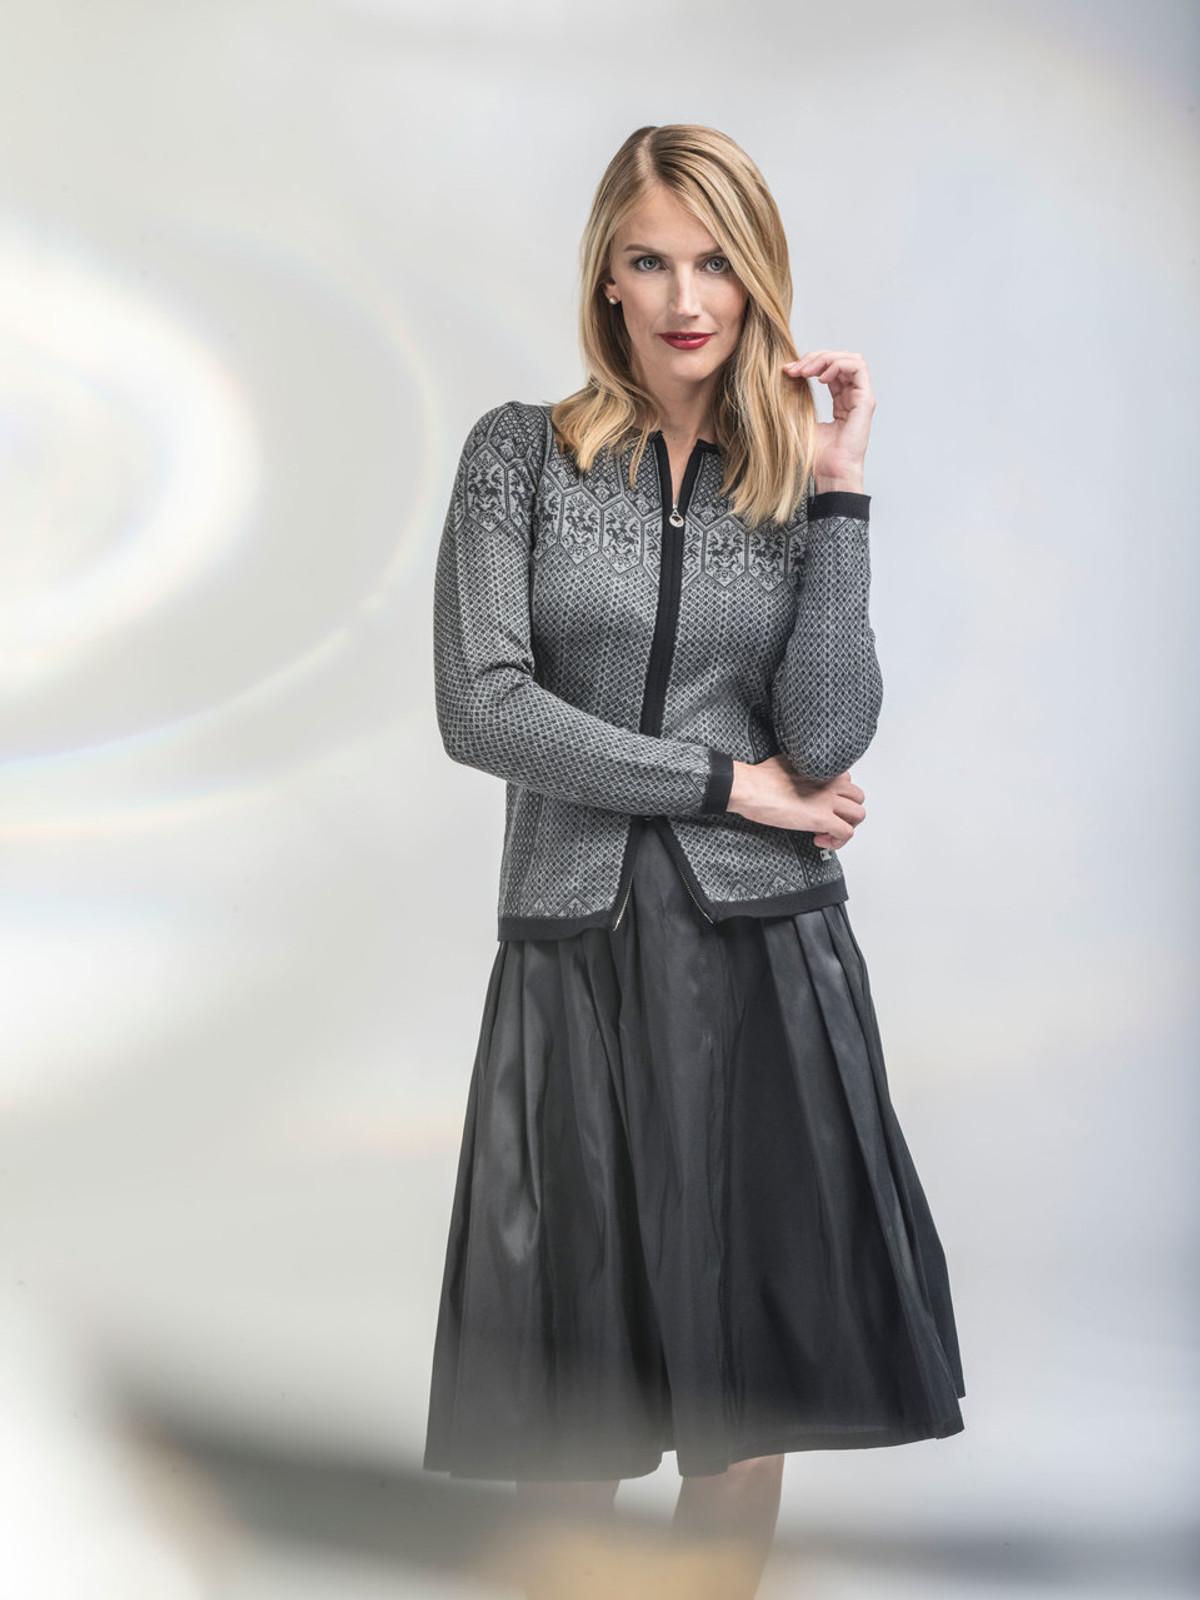 Woman wearing Dale of Norway's Sigrid ladies cardigan in Black/Dark Charcoal/Smoke, 82071-T.